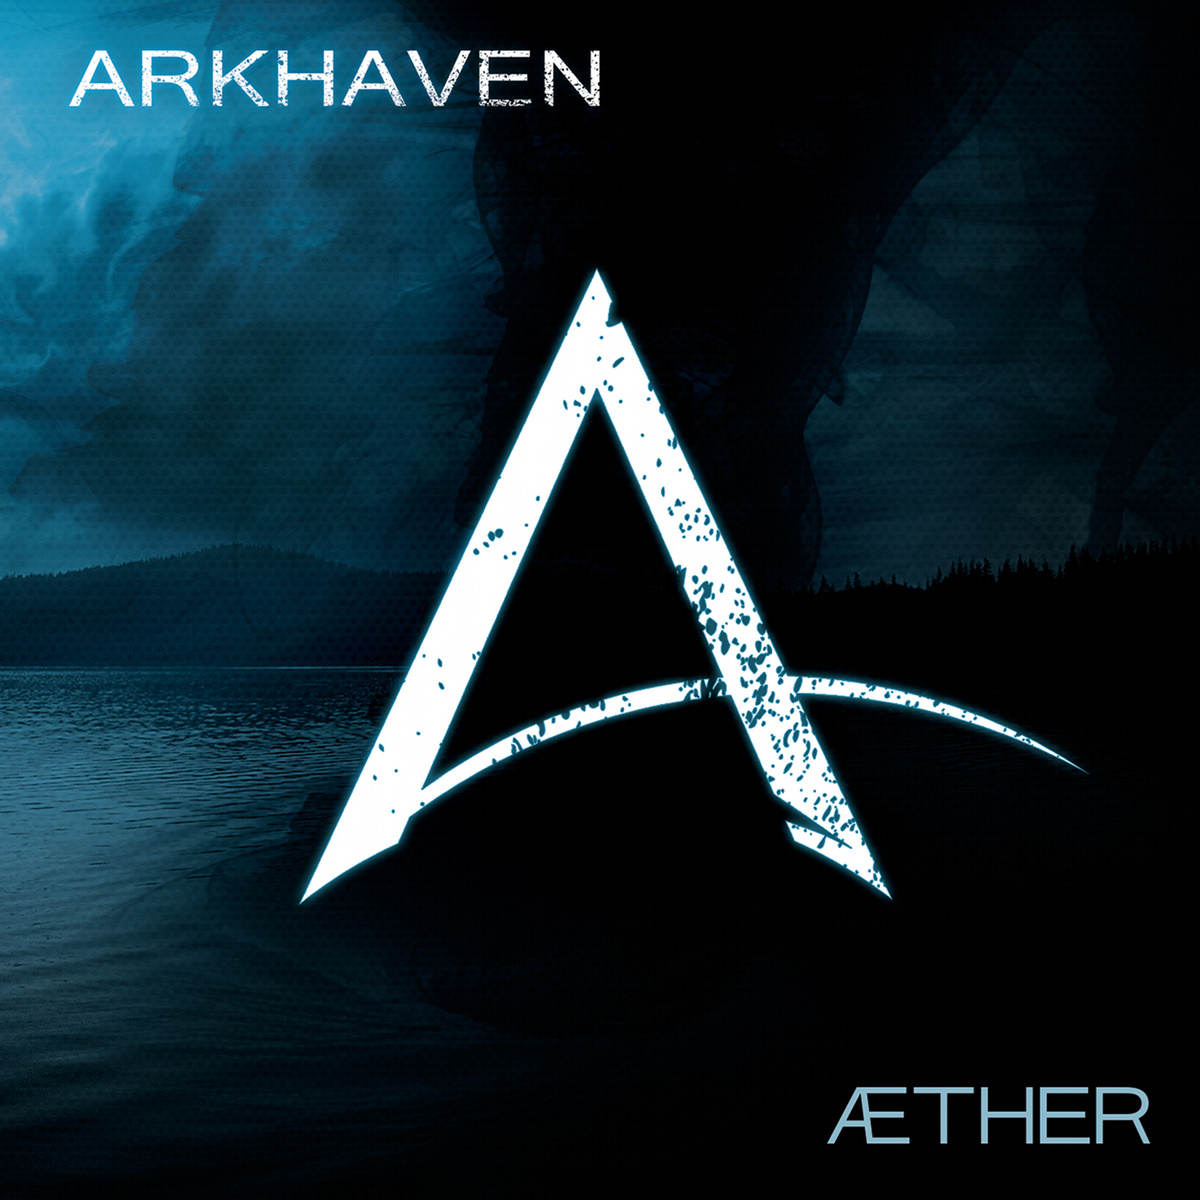 arkhaven.jpg